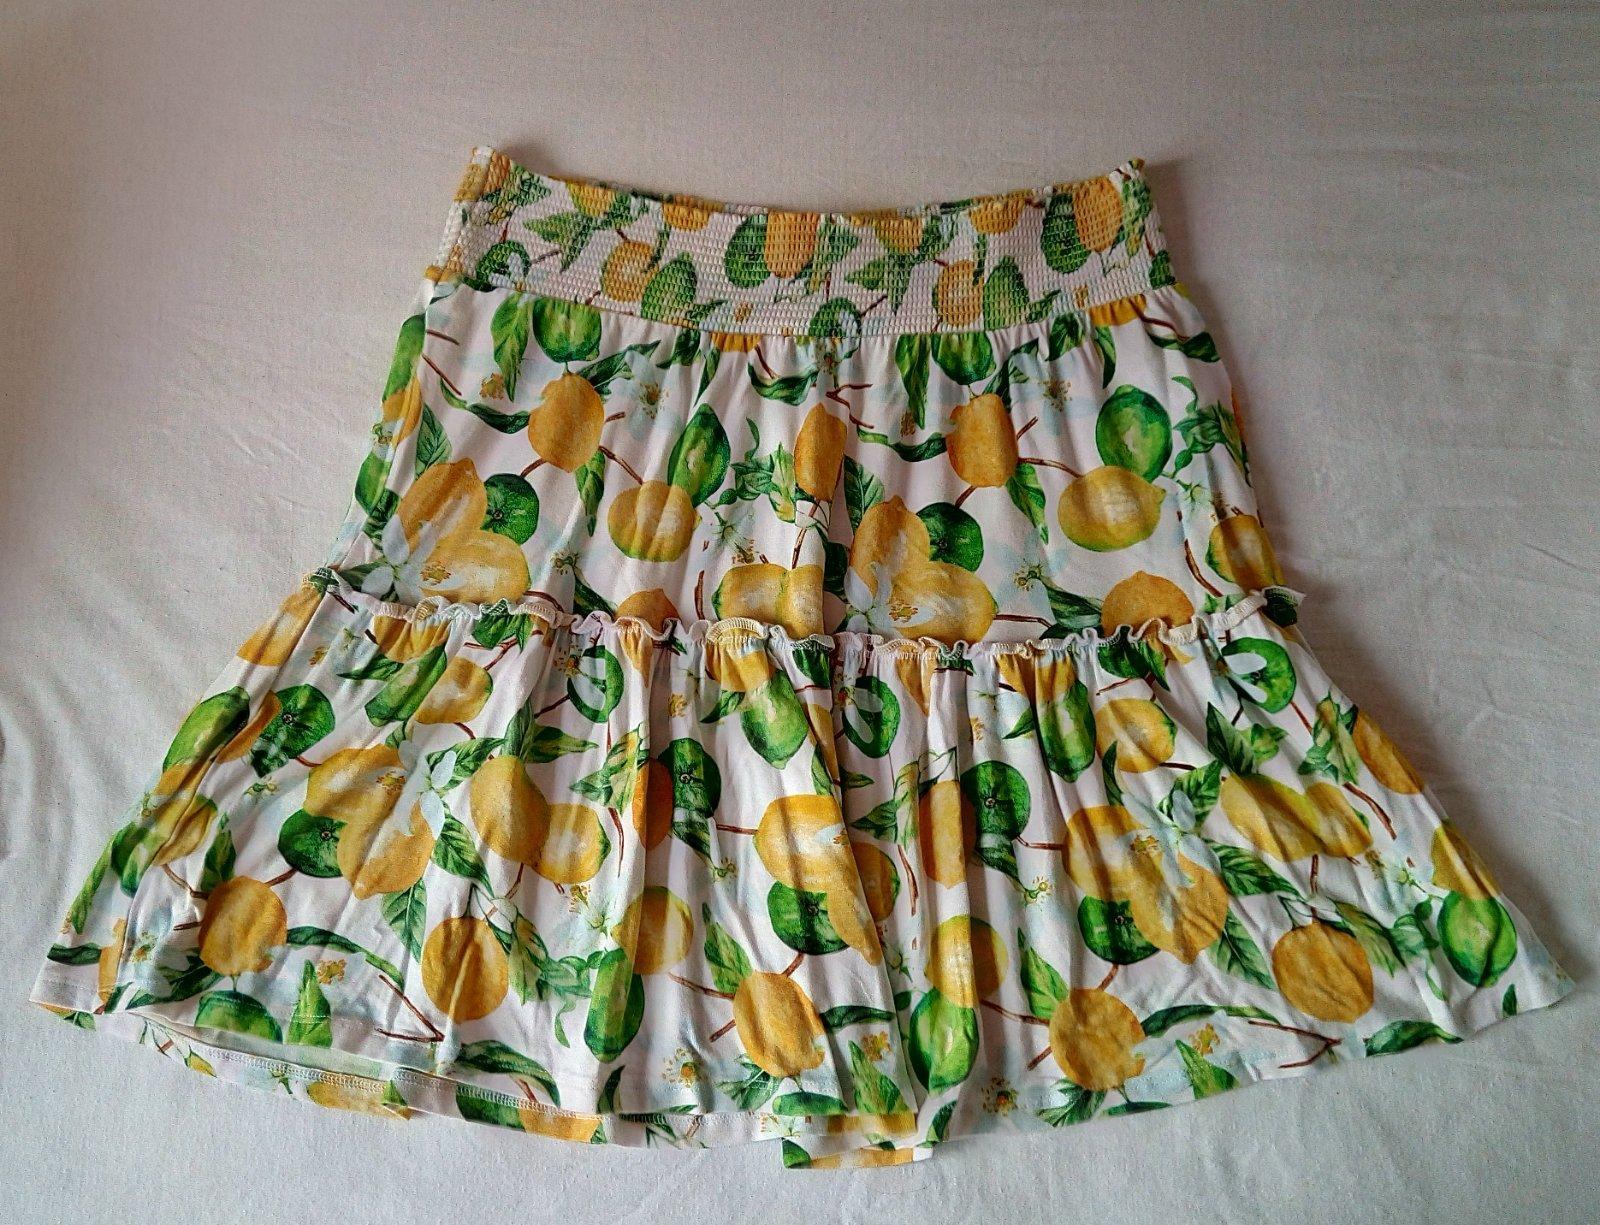 Vzorovaná sukňa s citrónmi Cubus L - Obrázok č. 1